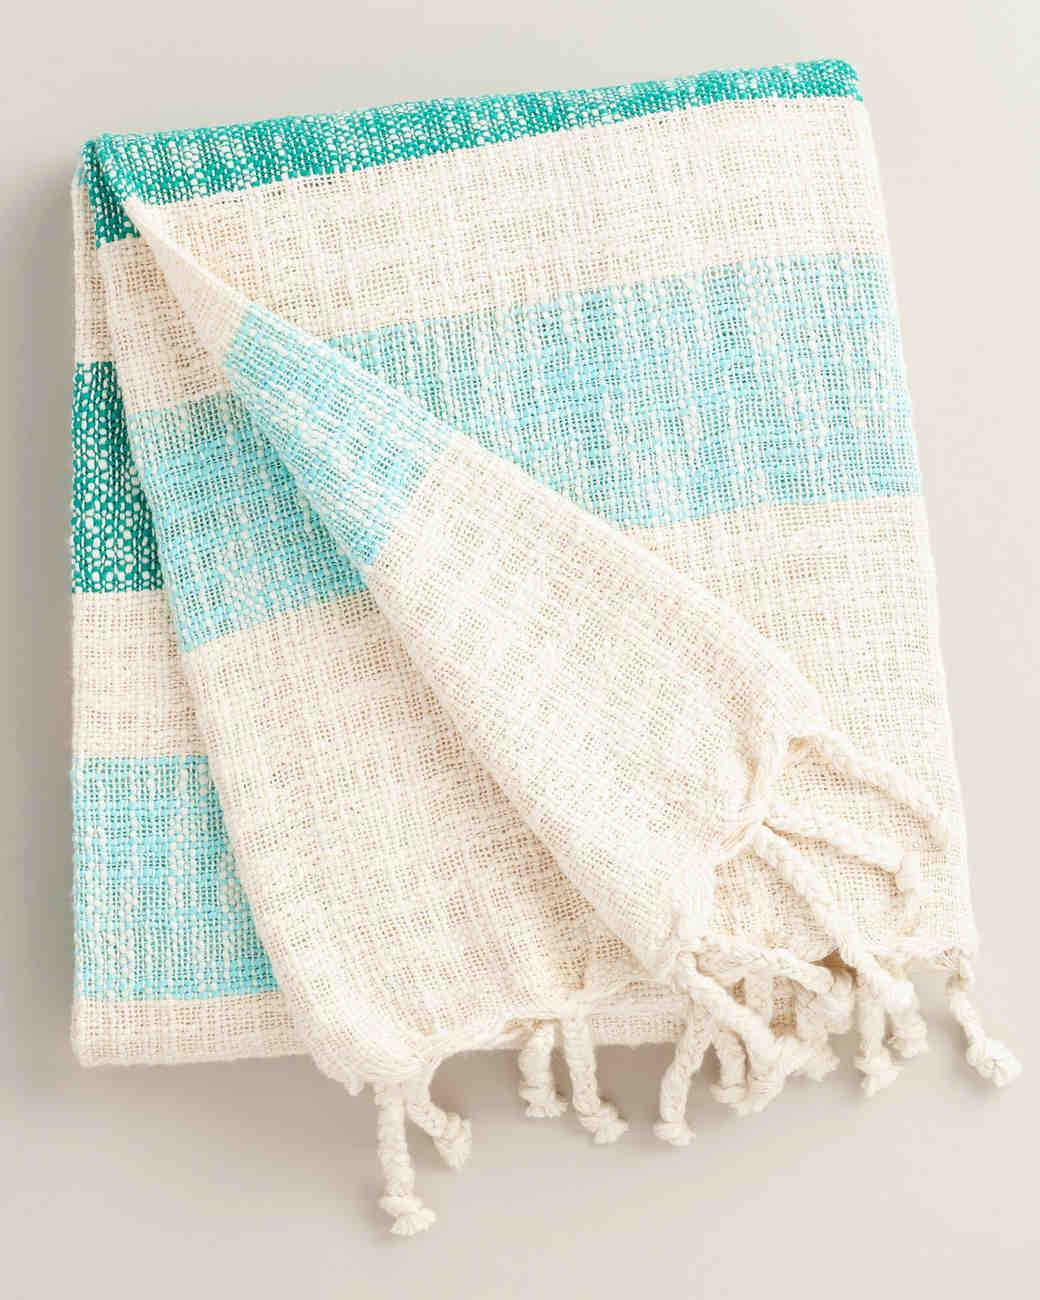 engagement-gifts-world-market-picnic-blanket-0516.jpg